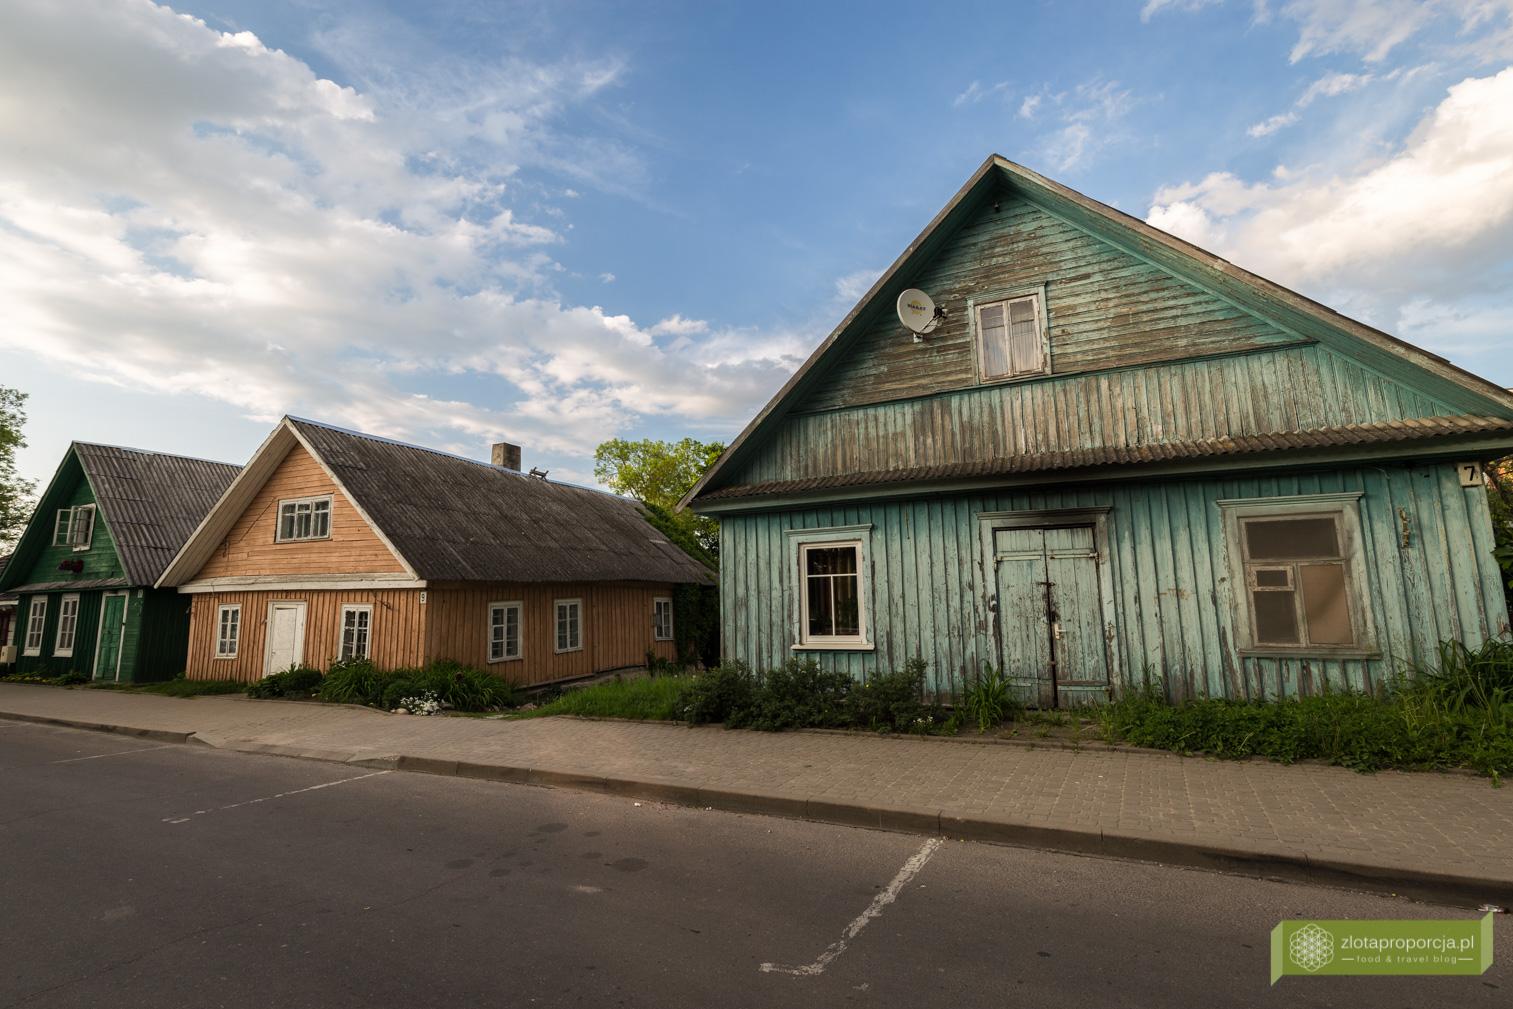 Karaimska chata, Karaimi, Troki, okolice Wilna, Litwa, atrakcje Litwy